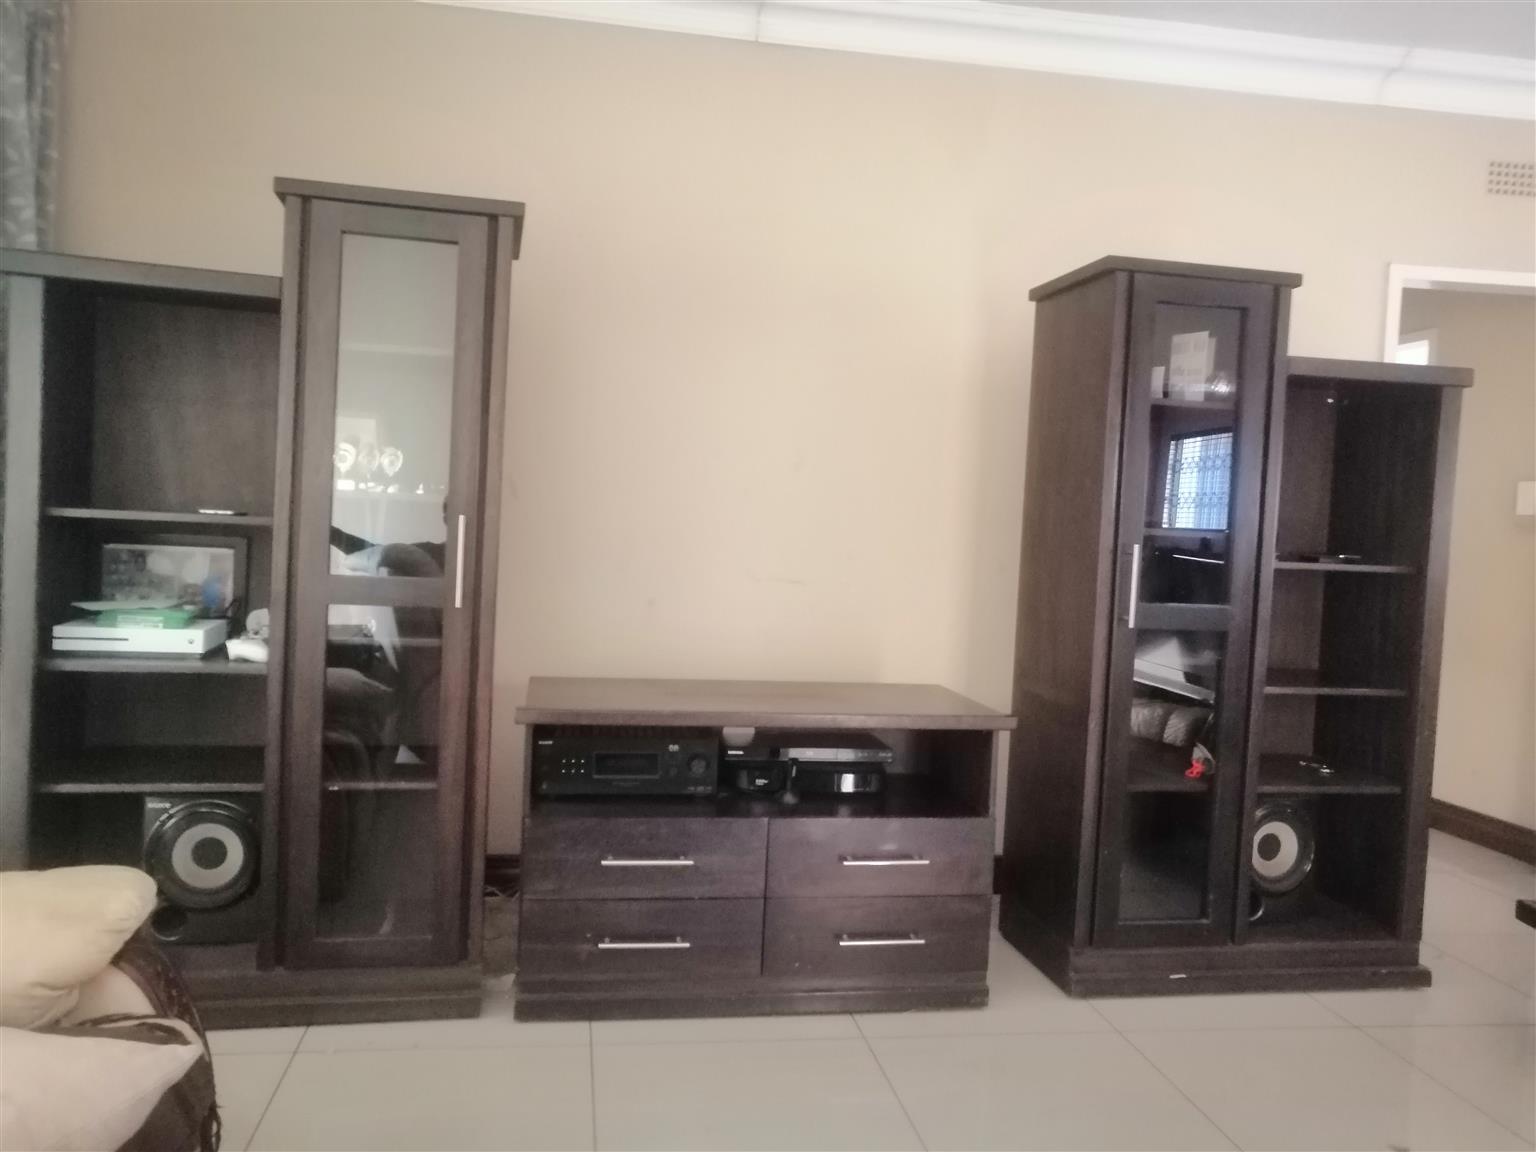 4 piece TV unit